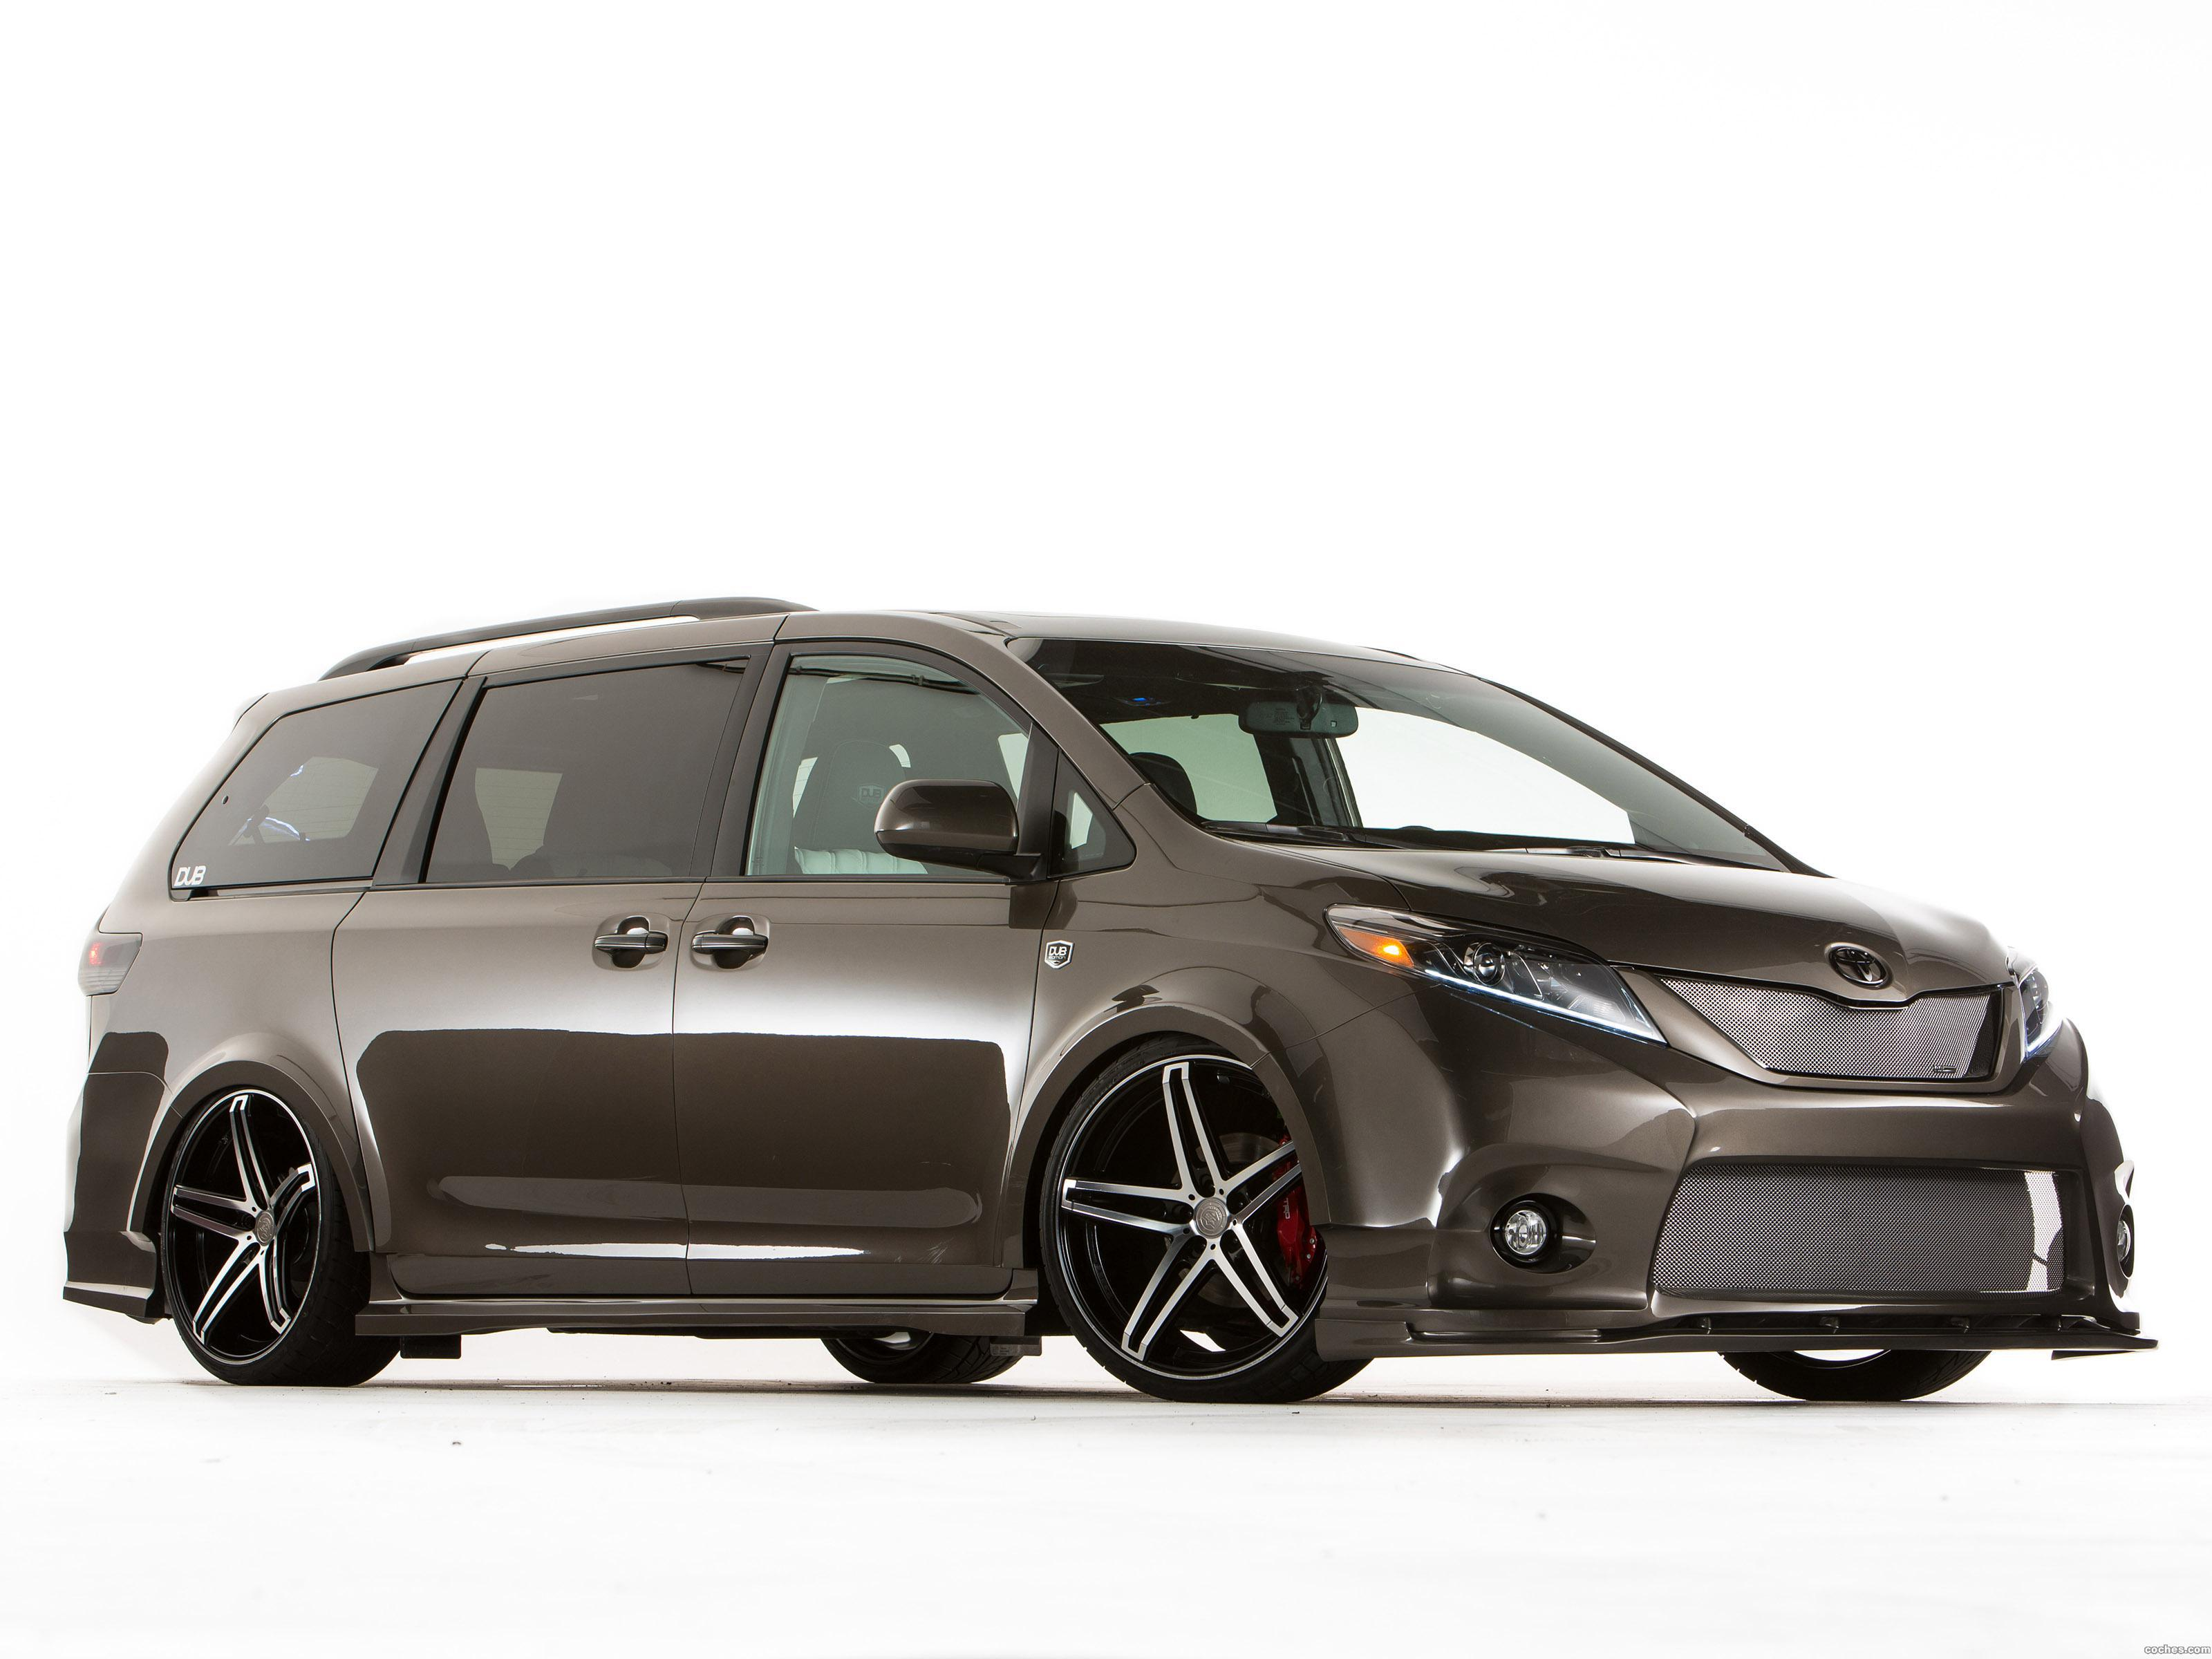 Foto 0 de Toyota Sienna Dub Edition Concept 2014